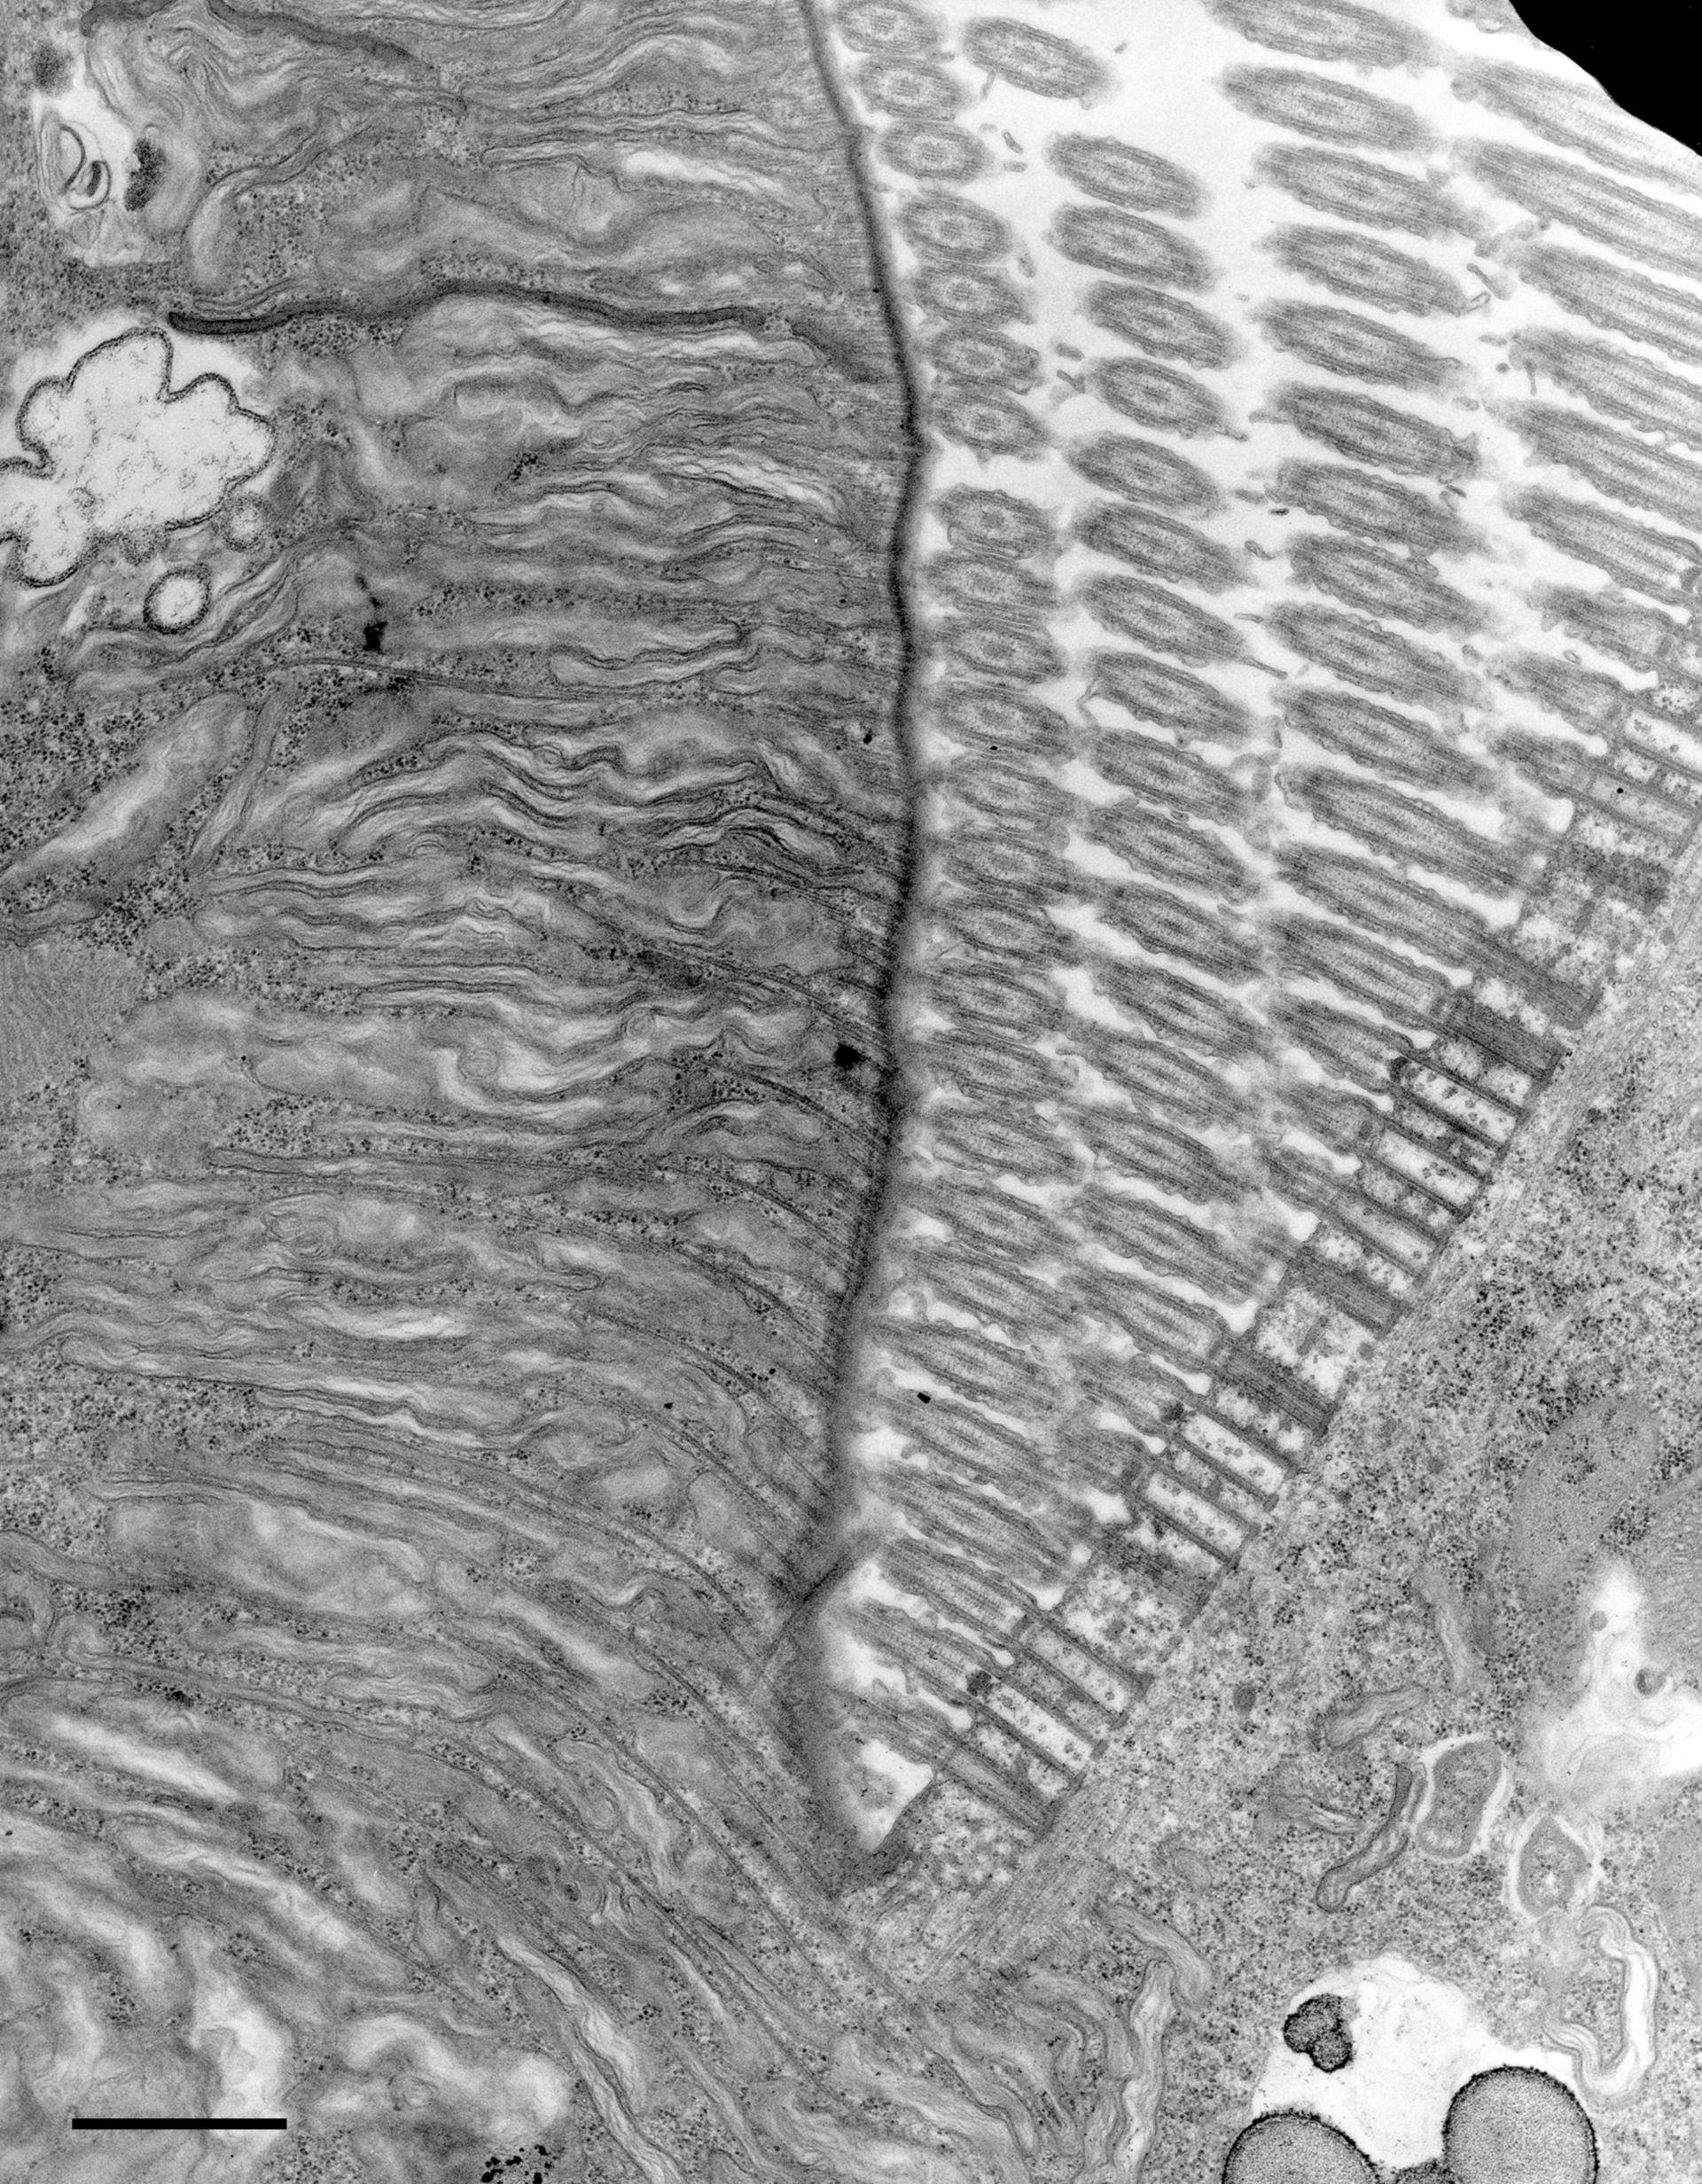 Euplotes sp. (Cortical cytoskeleton) - CIL:12341